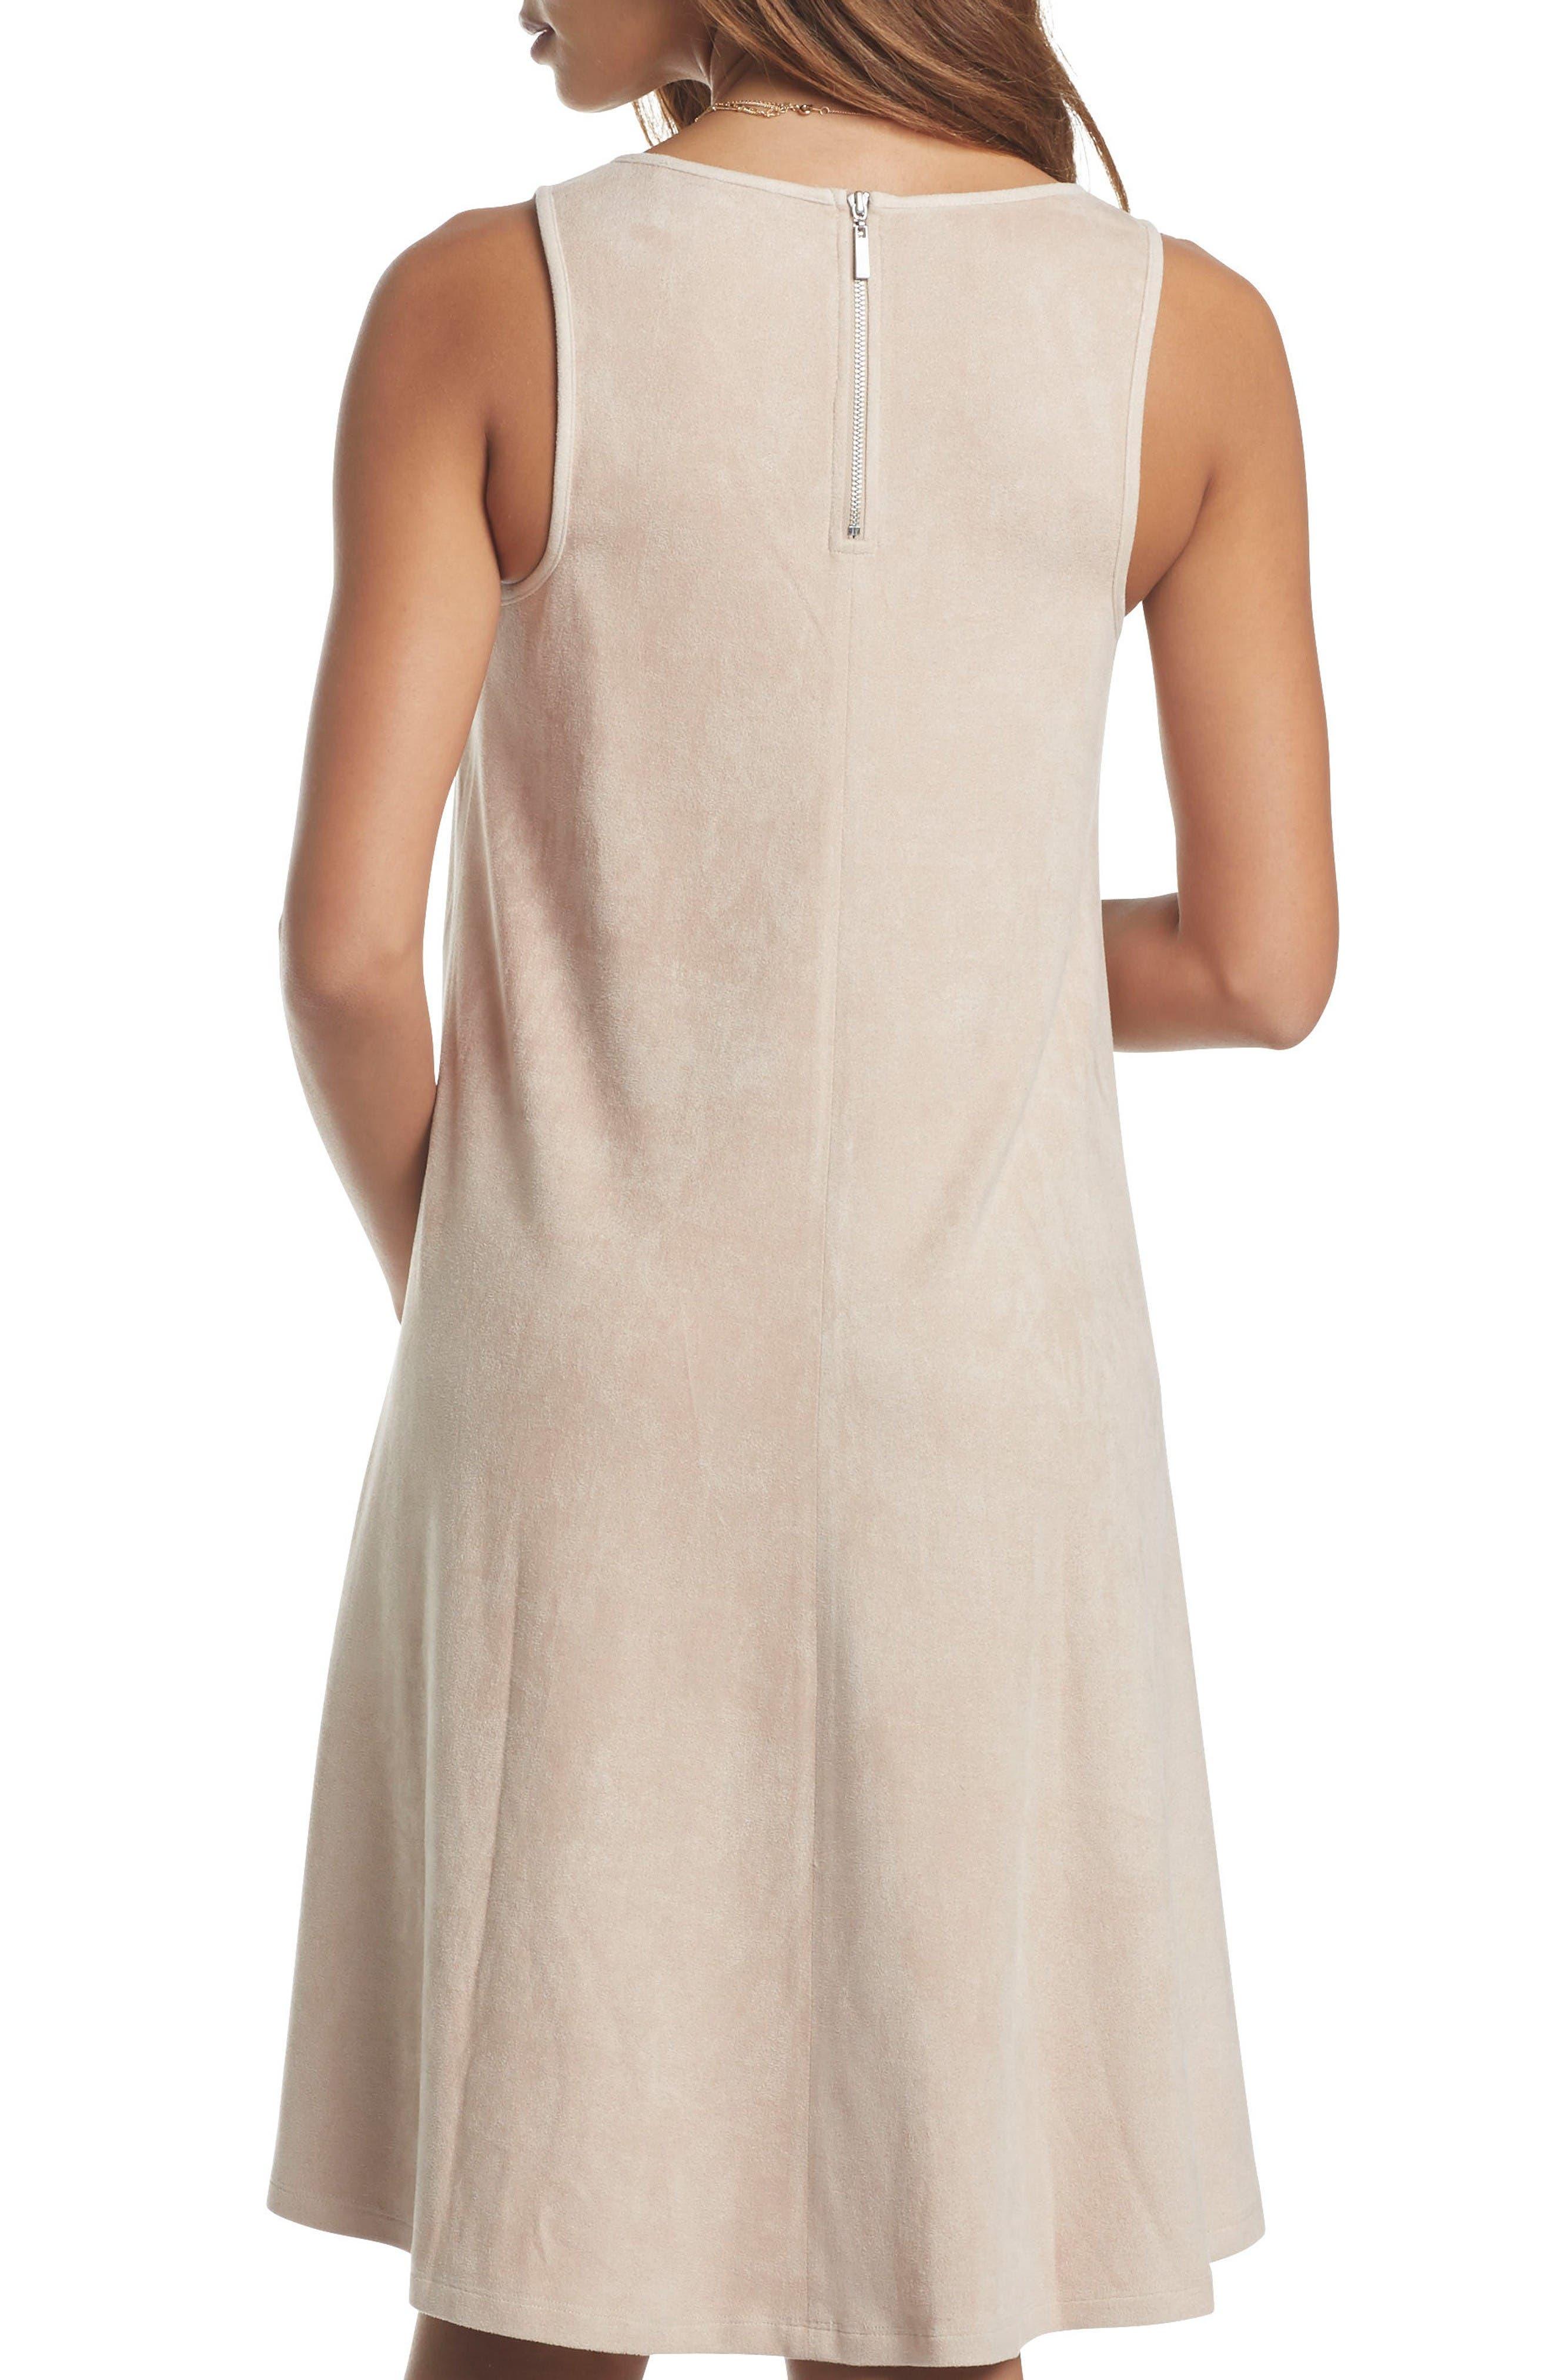 Zandra Sueded Maternity Dress,                             Alternate thumbnail 2, color,                             Almond